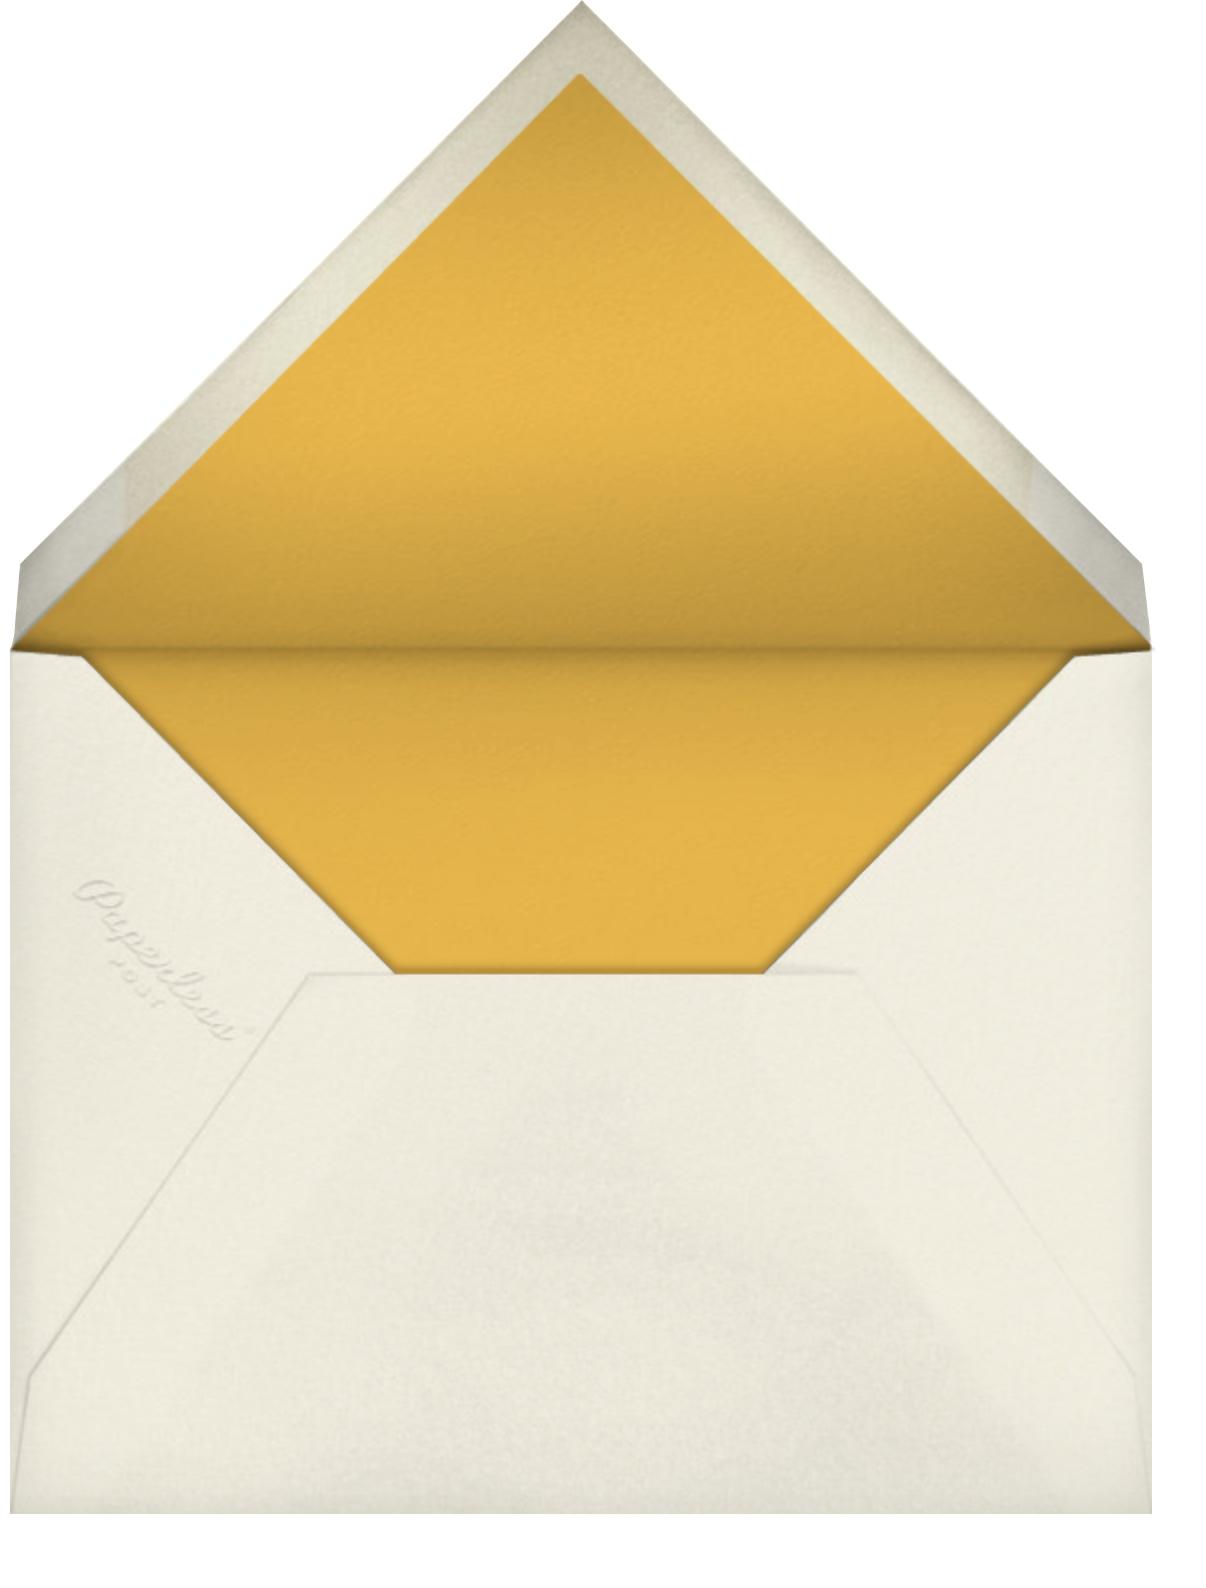 Birthday Girl (Blanca Gomez) - Deep - Red Cap Cards - Birthday - envelope back